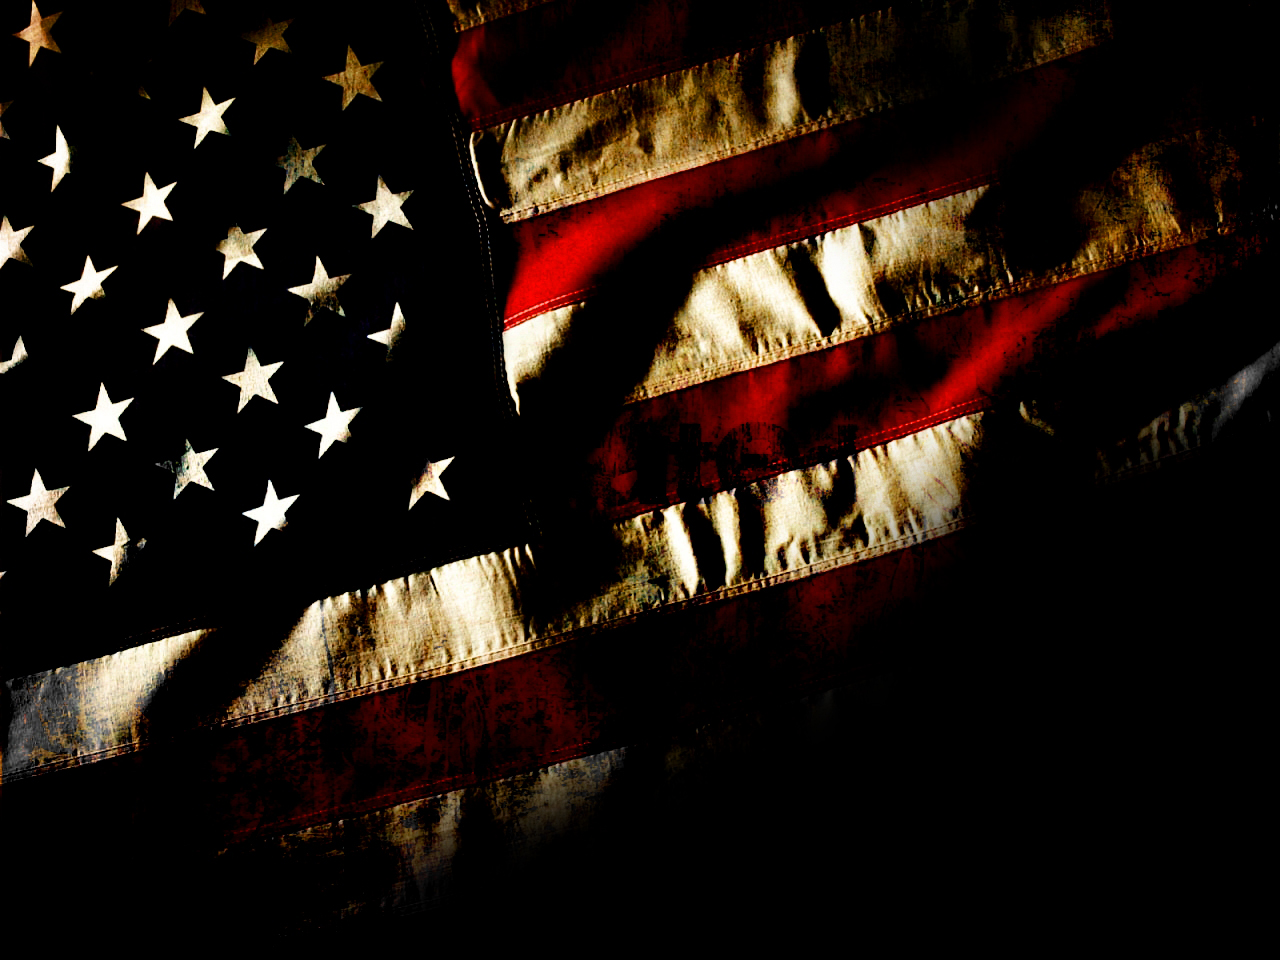 American Flag Image HD Wallpaper 3605 Wallpaper computer best 1280x960